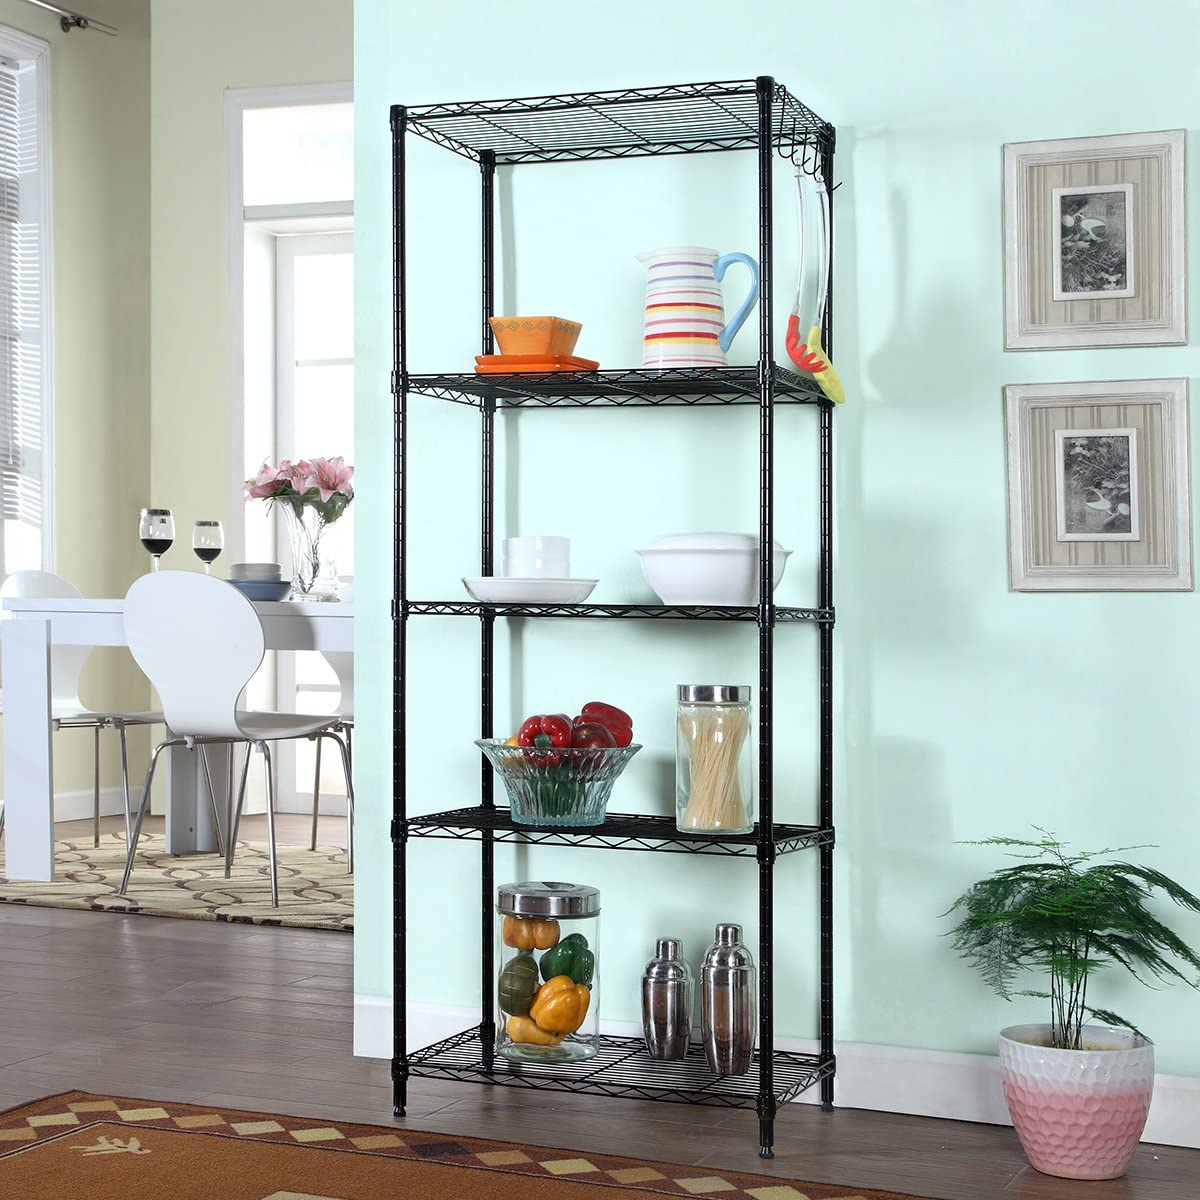 5-Shelf D30cm W55cm H150cm Black Steel Storage Rack Adjustable Wire Shelving Unit WJM30135-5BK